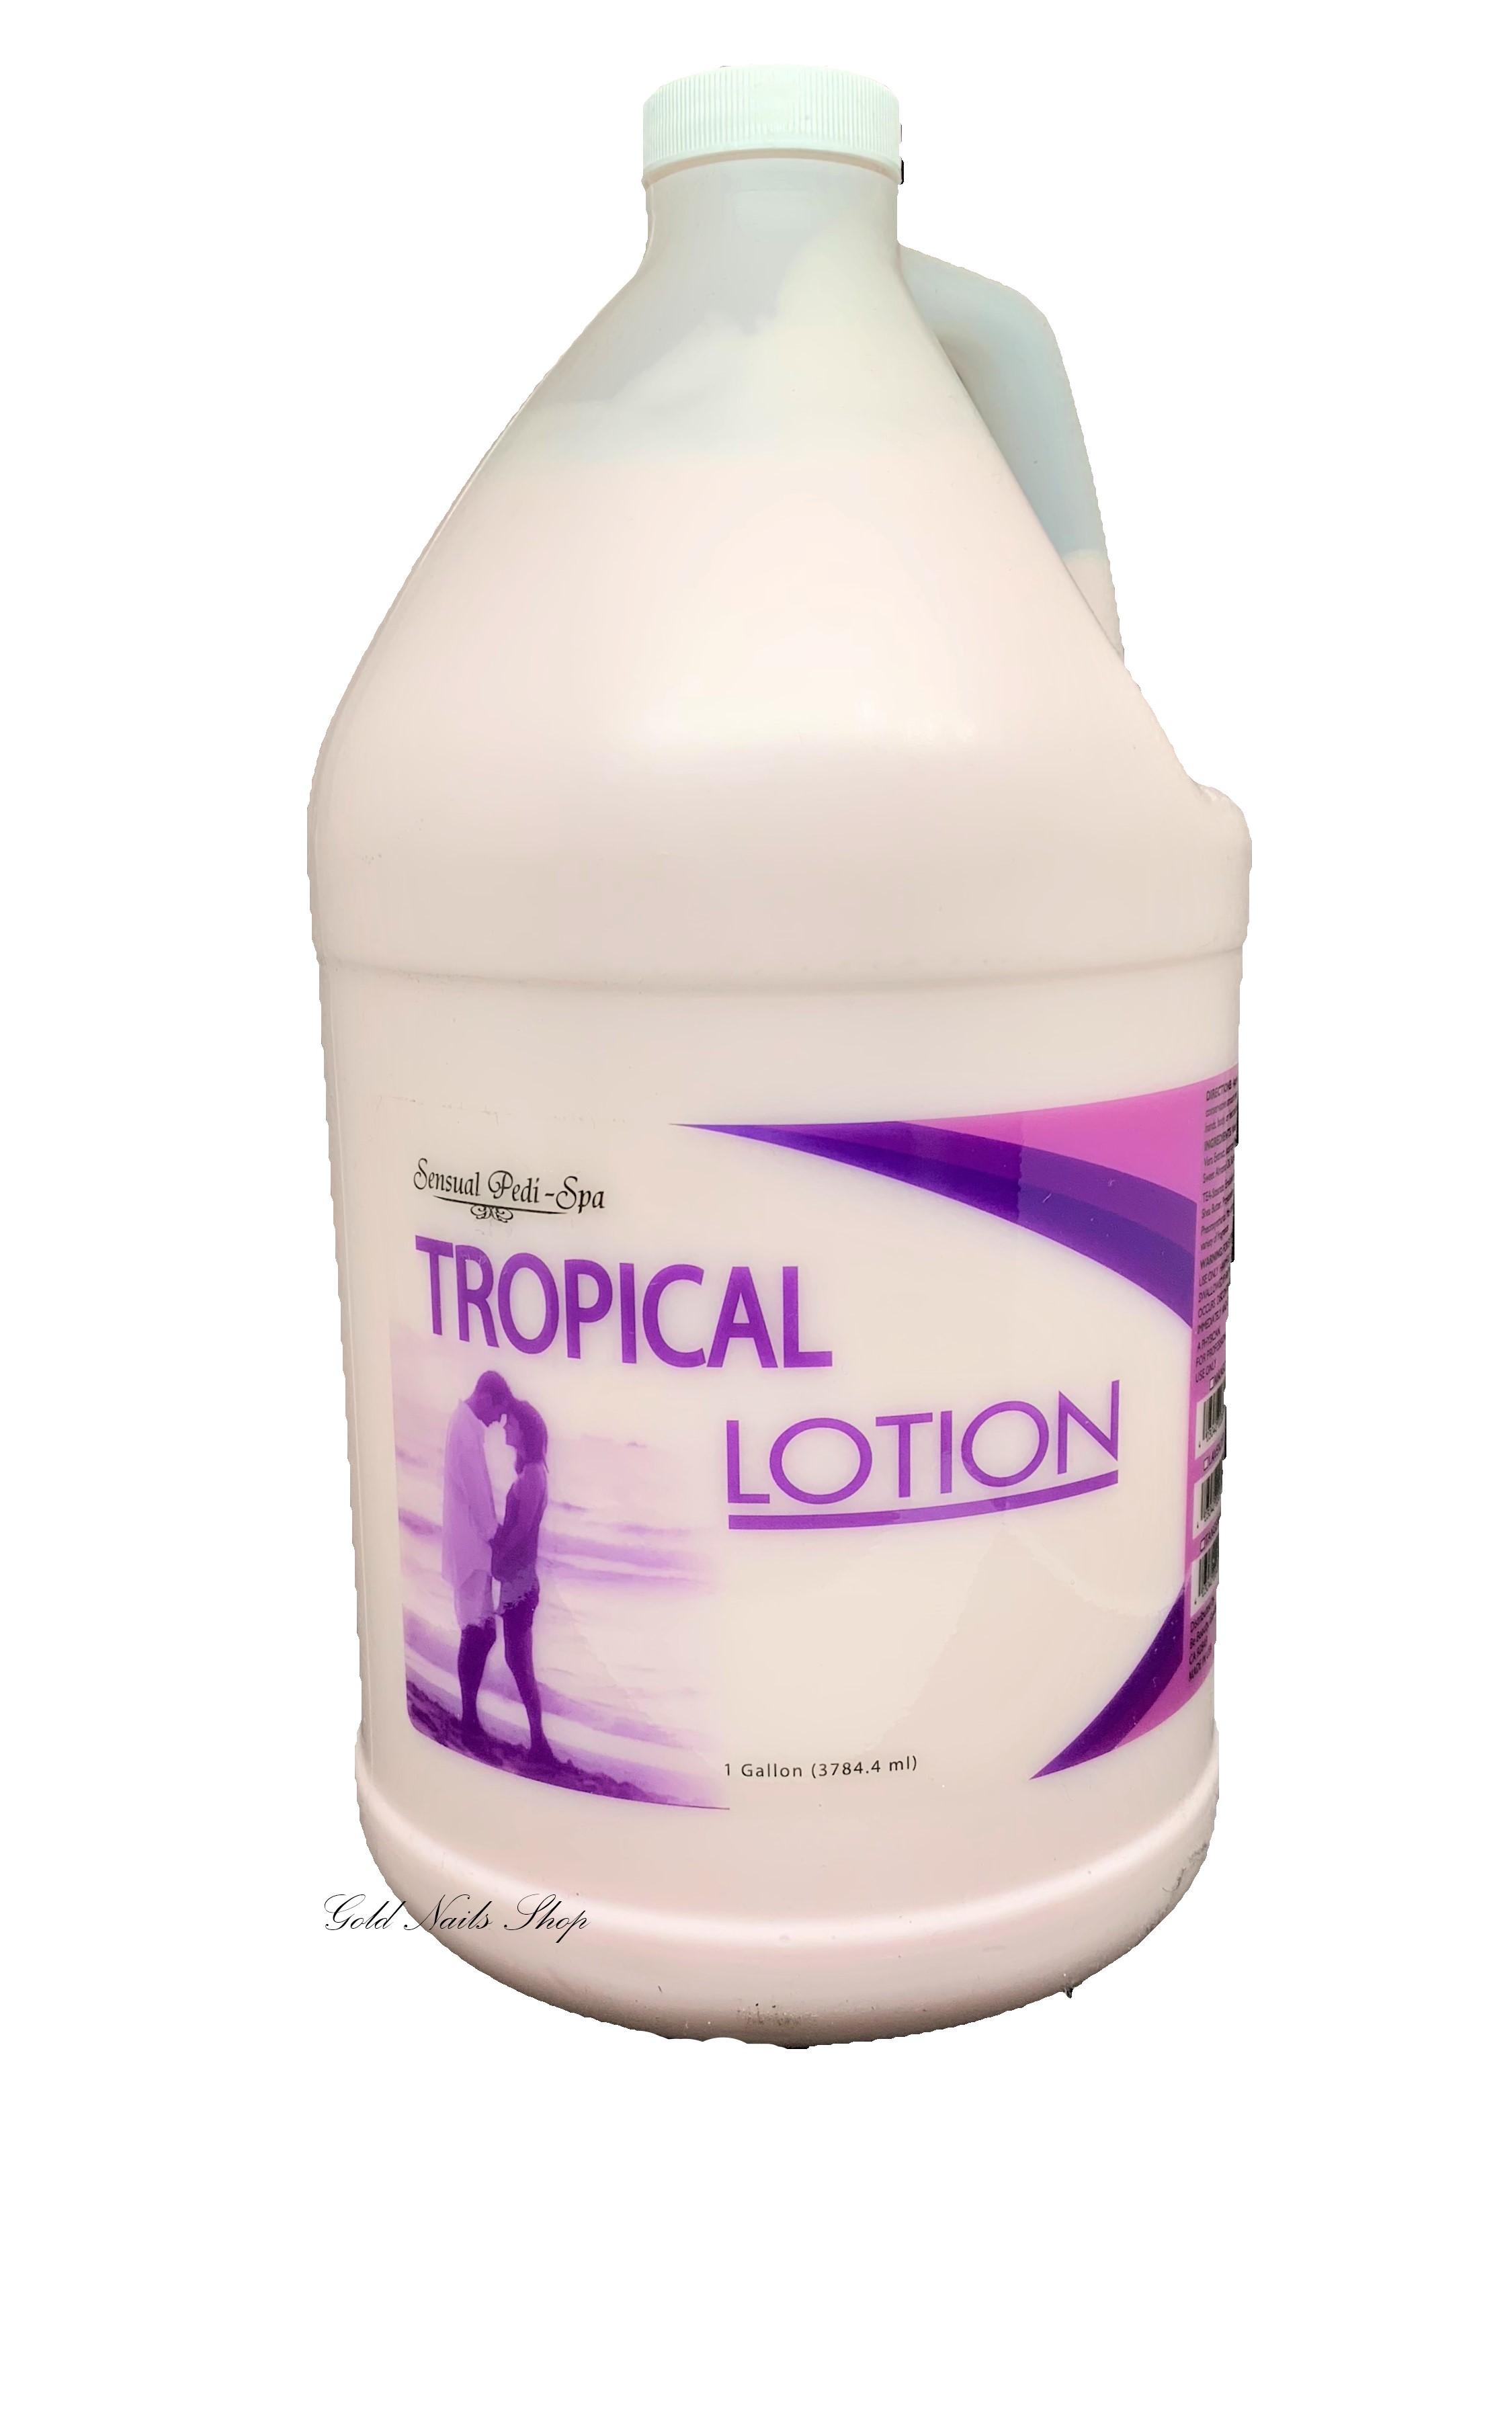 Tropical Lotion – Gallon